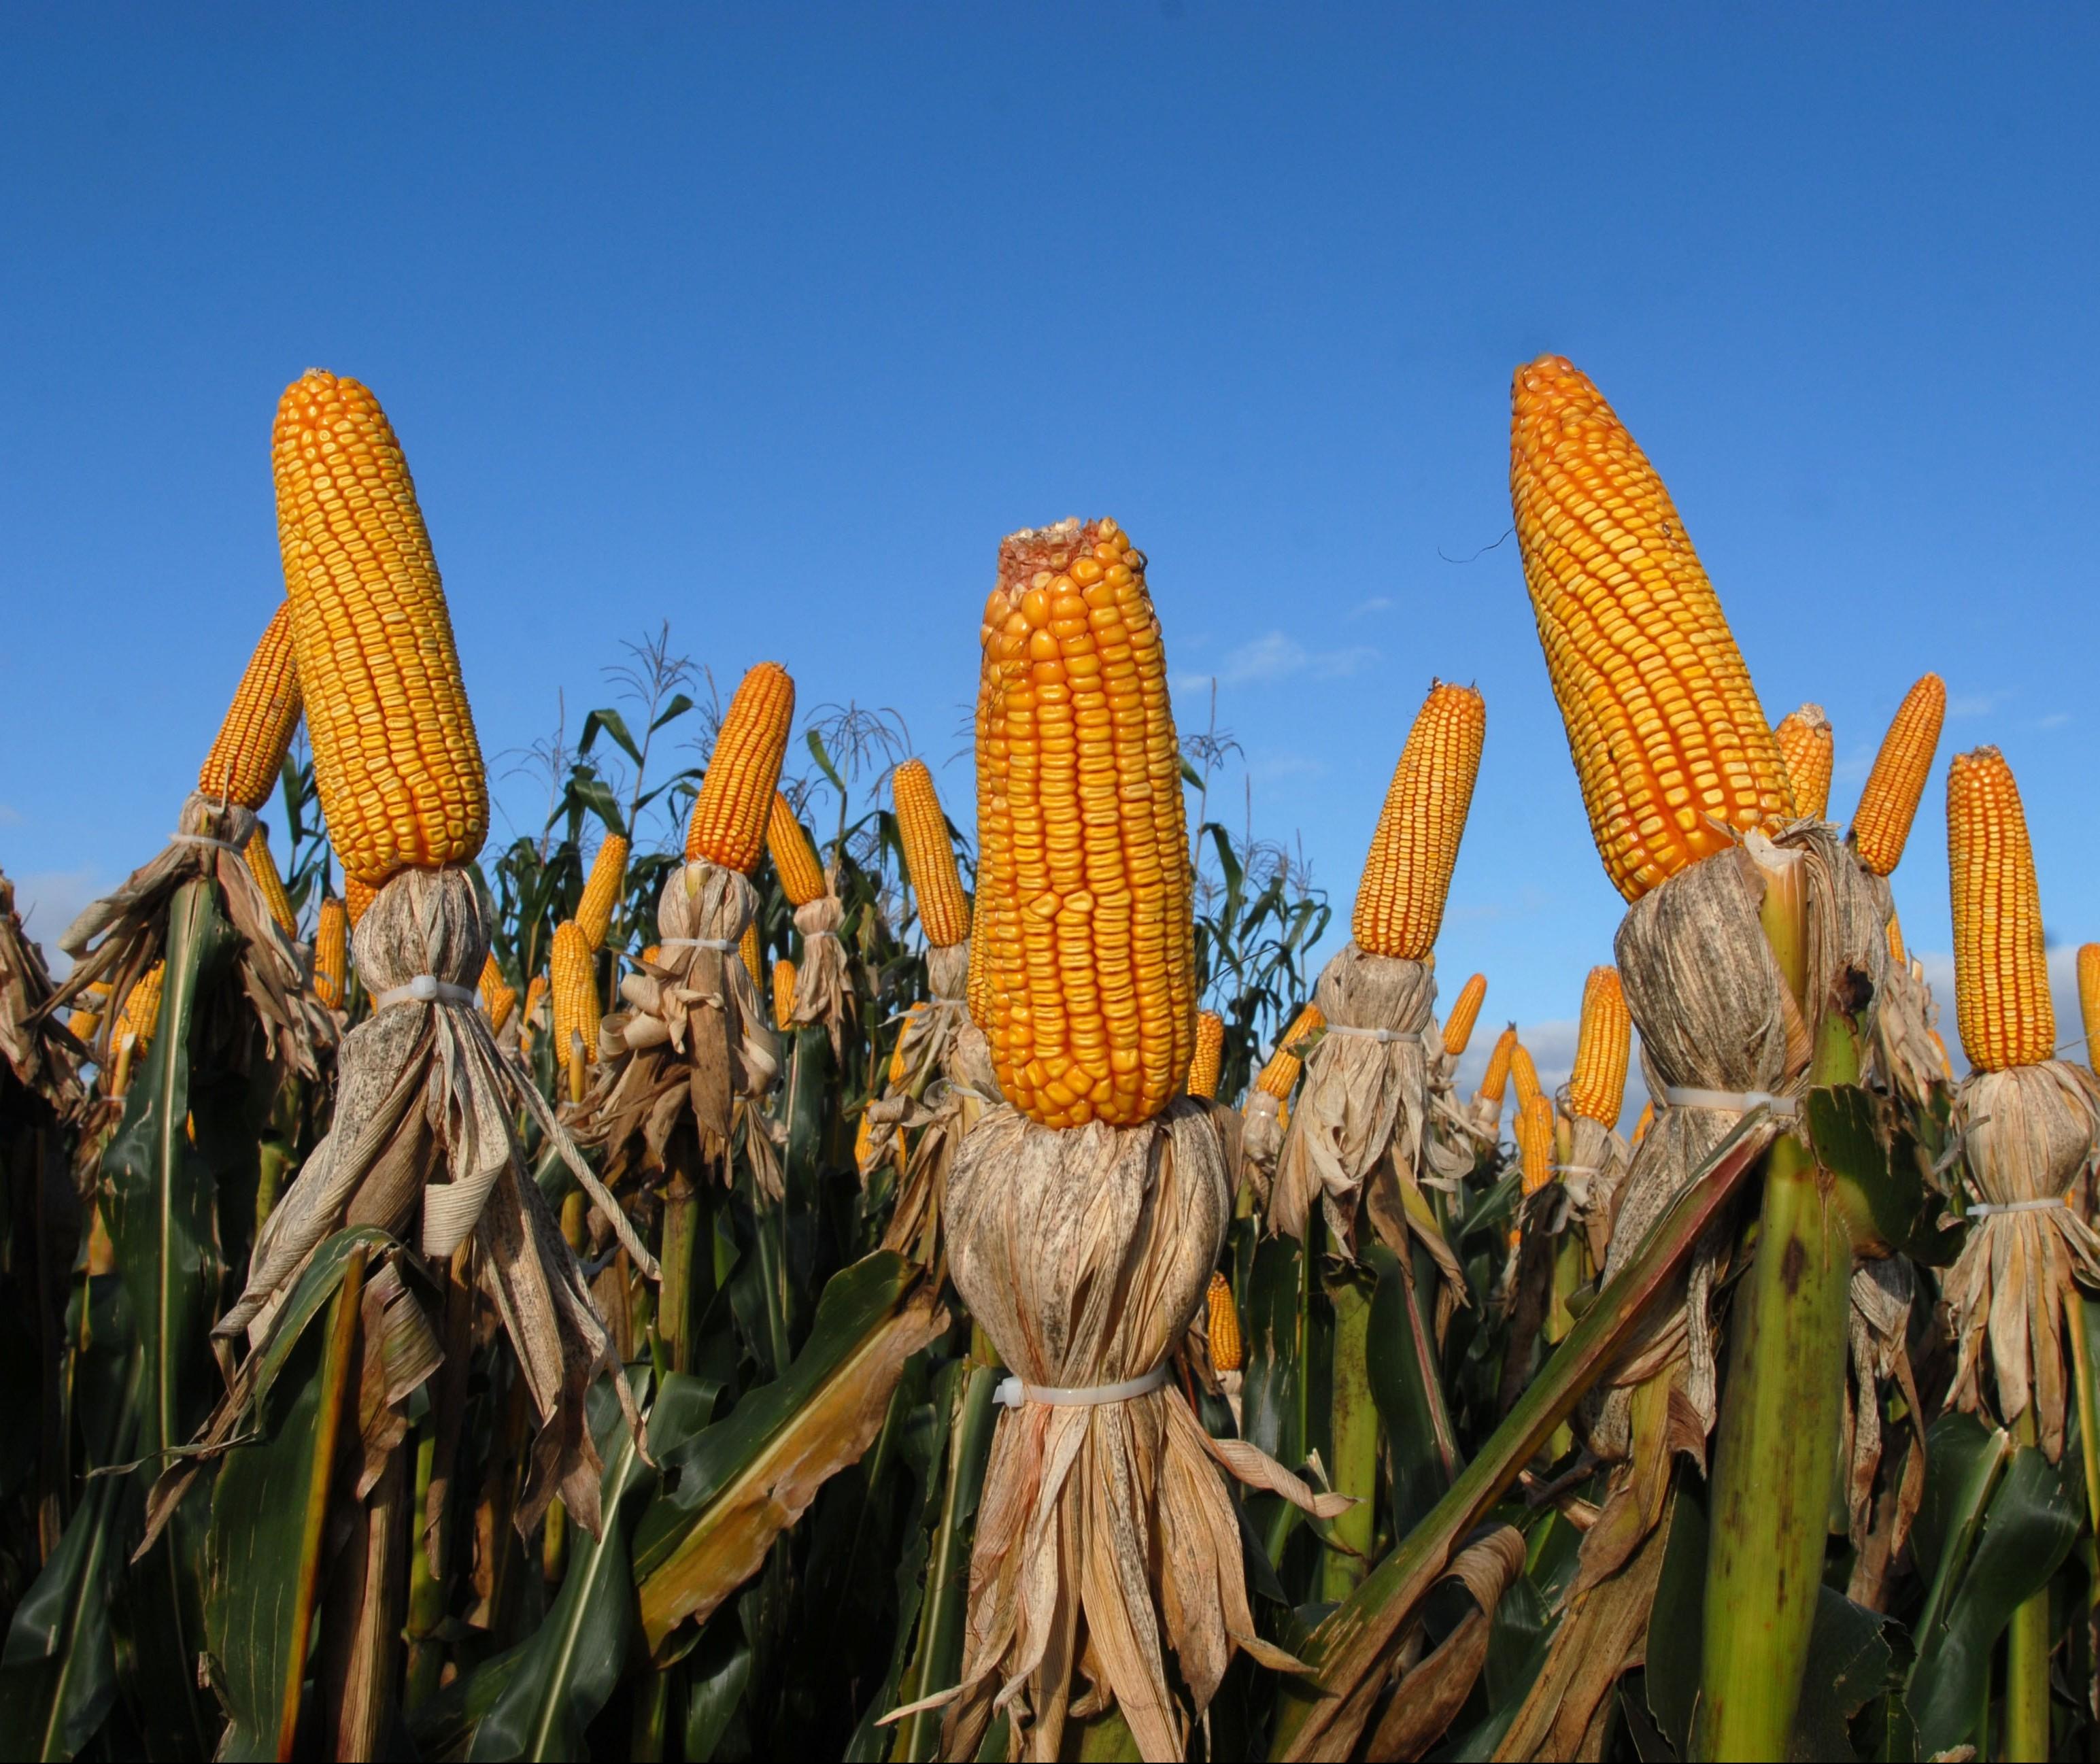 Colheita do milho 2ª safra avança 25% no Paraná